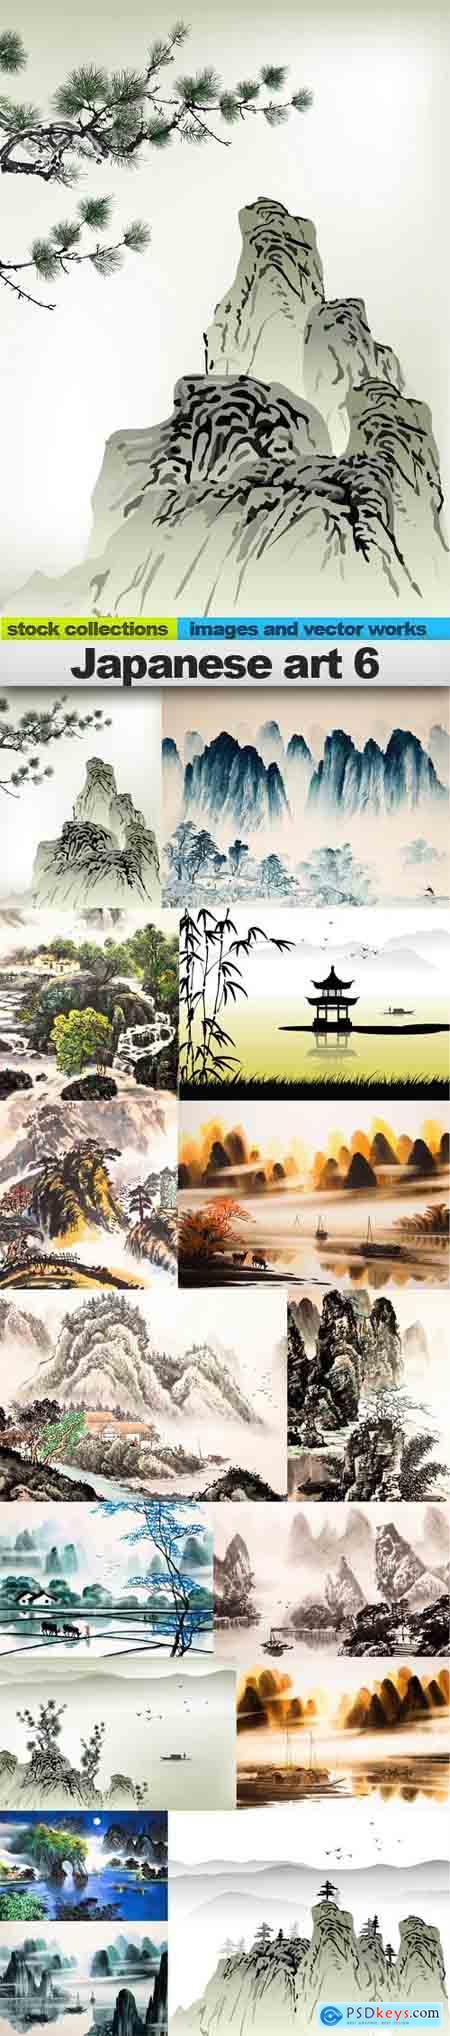 Japanese art 6, 15 x UHQ JPEG